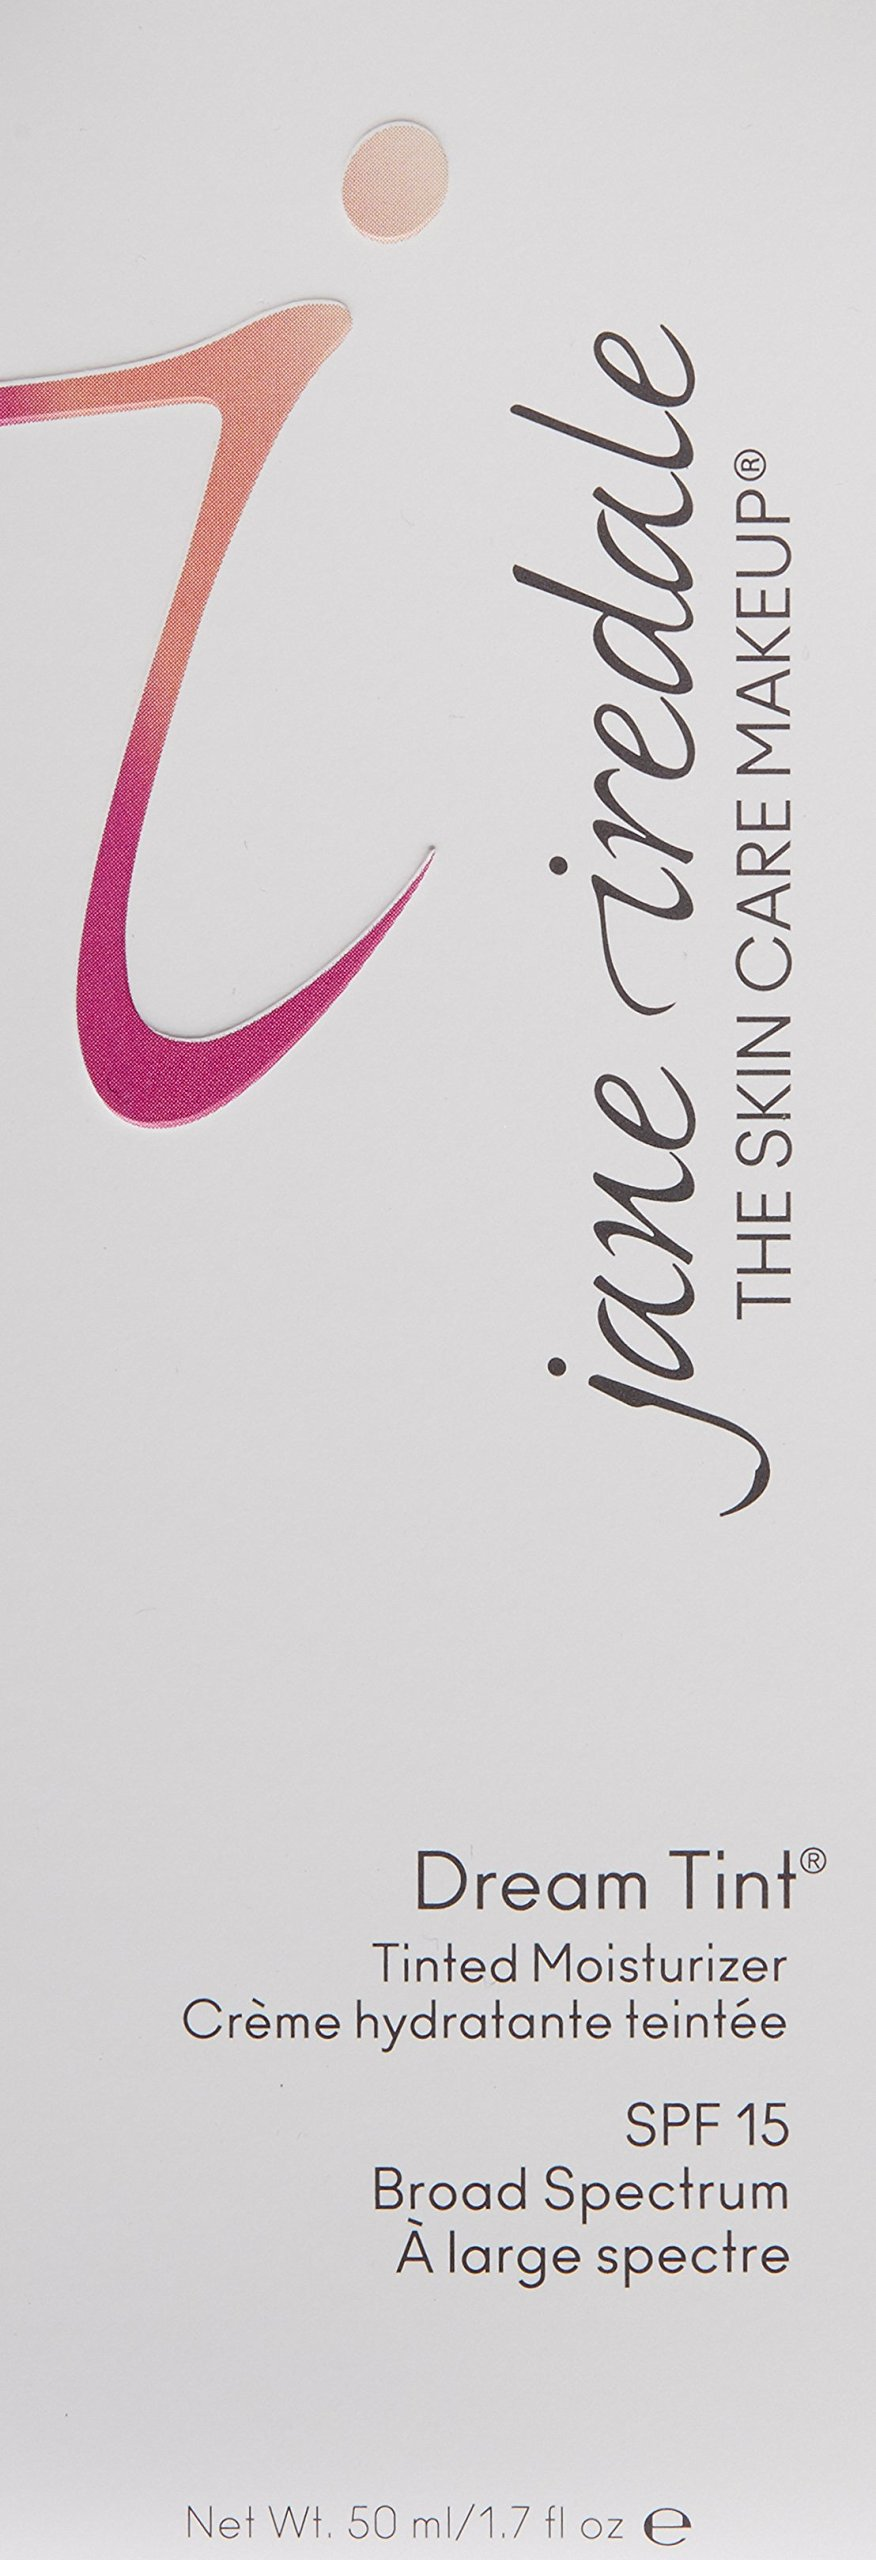 jane iredale Dream Tint Tinted Moisturizer, Medium, 1.7 oz. by jane iredale (Image #4)